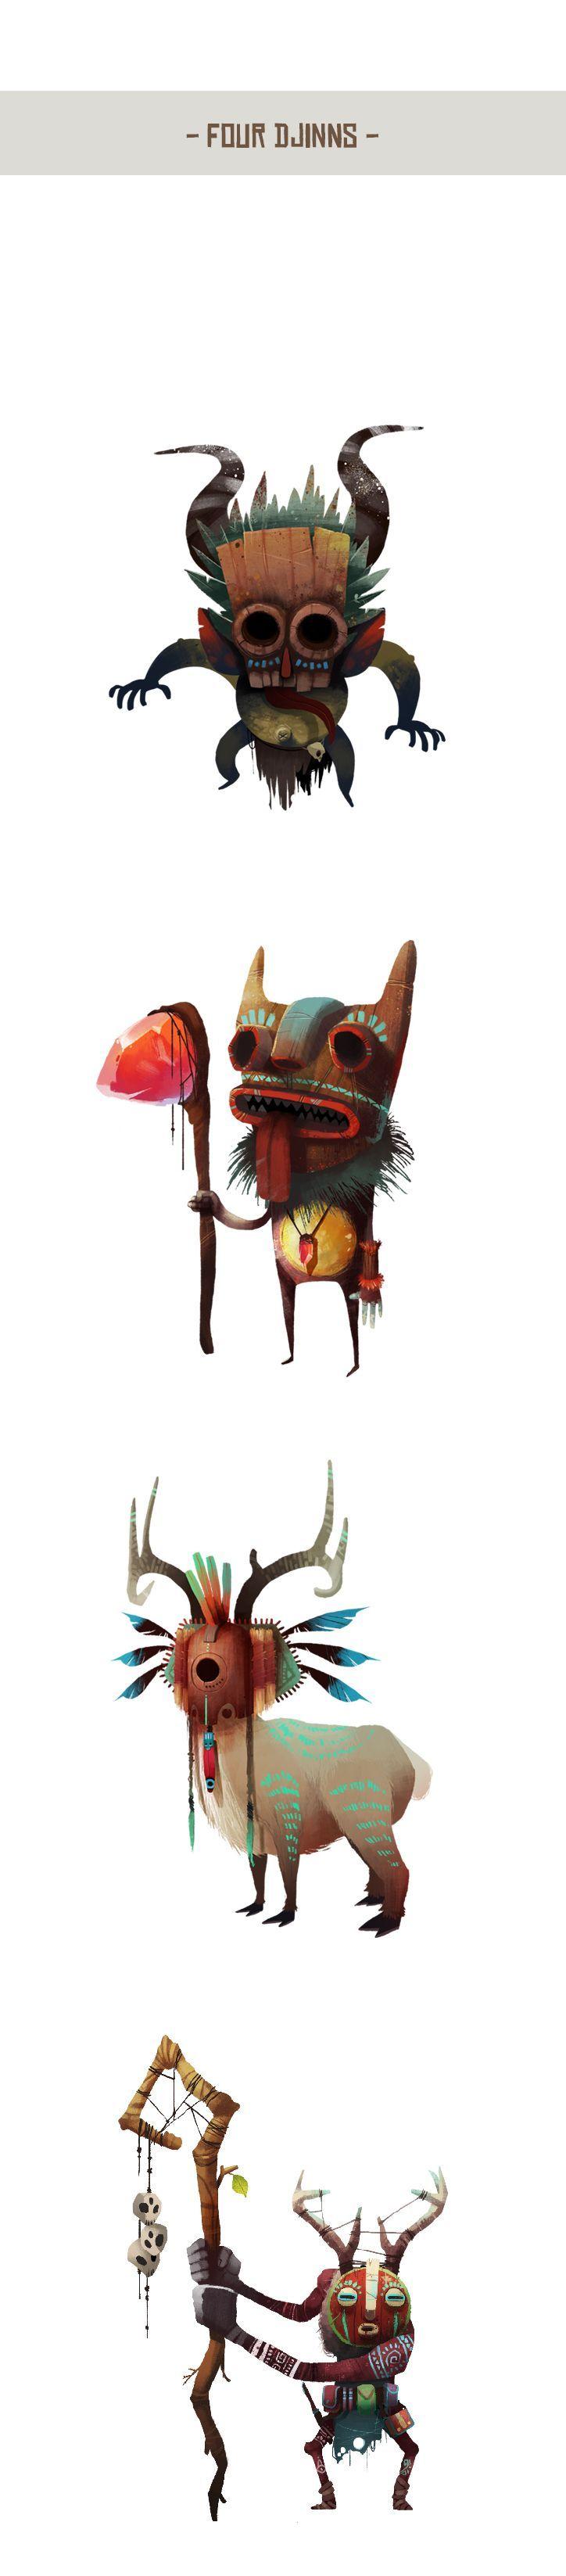 https://www.behance.net/gallery/16812879/-Four-Djinns- tribal characters masks organic nature illustration: